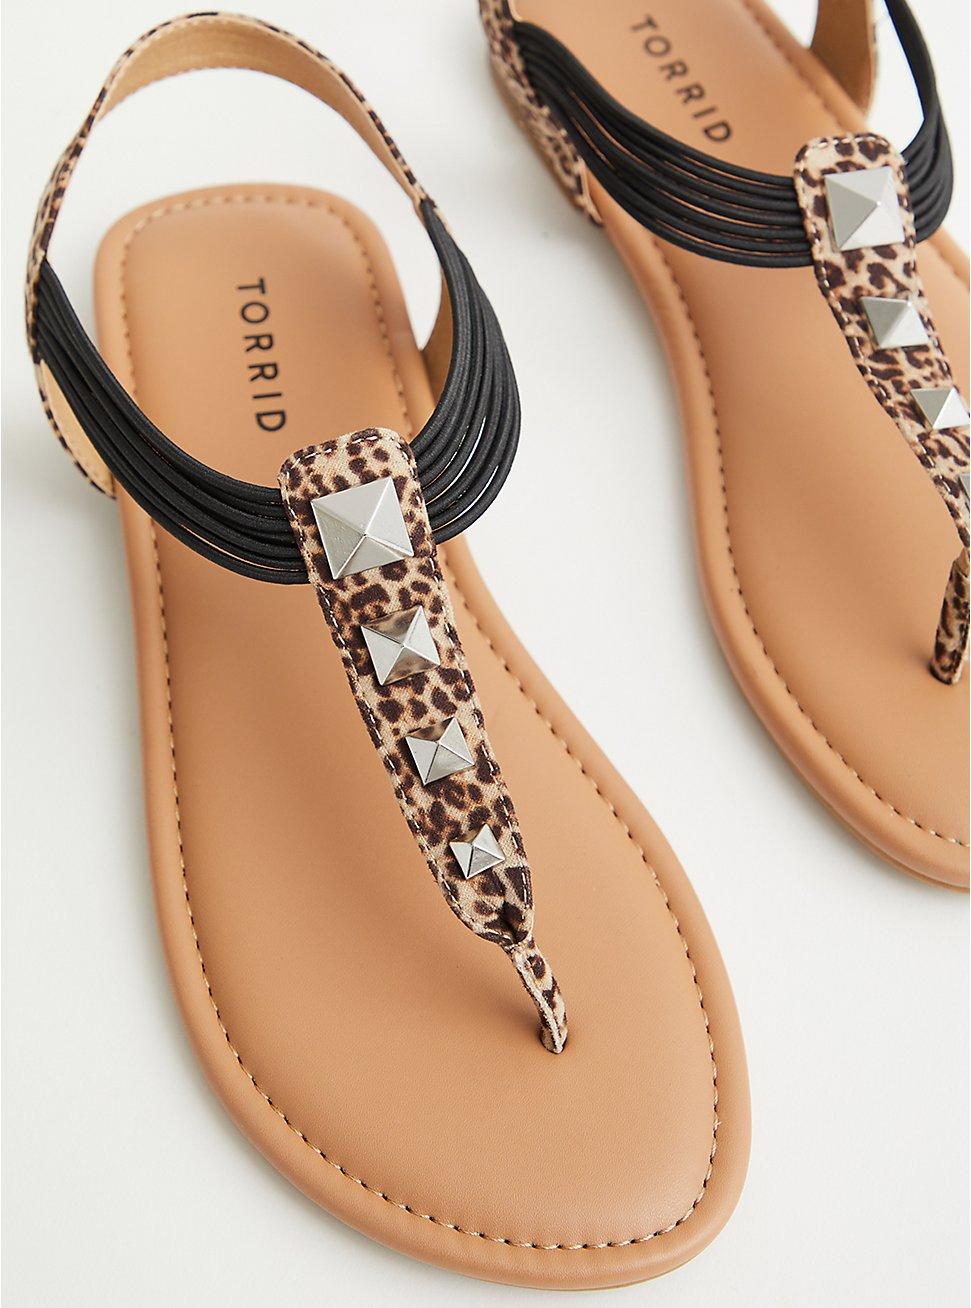 Leopard Faux Suede Studded T-Strap Sandal, ANIMAL, hi-res